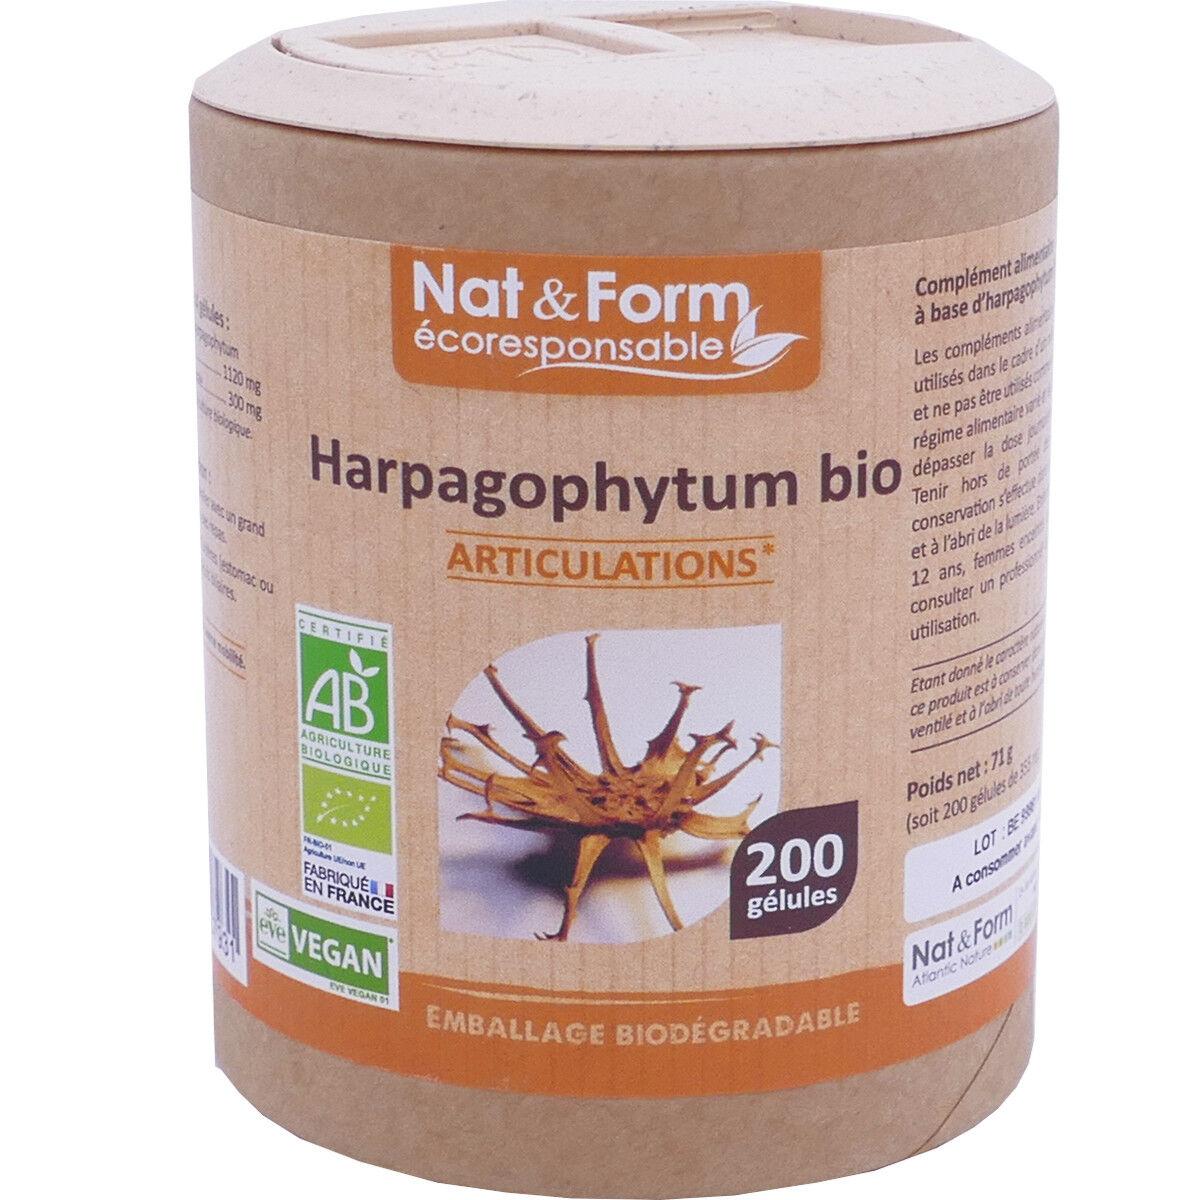 Nat & form harpagophytum bio 200 capsules